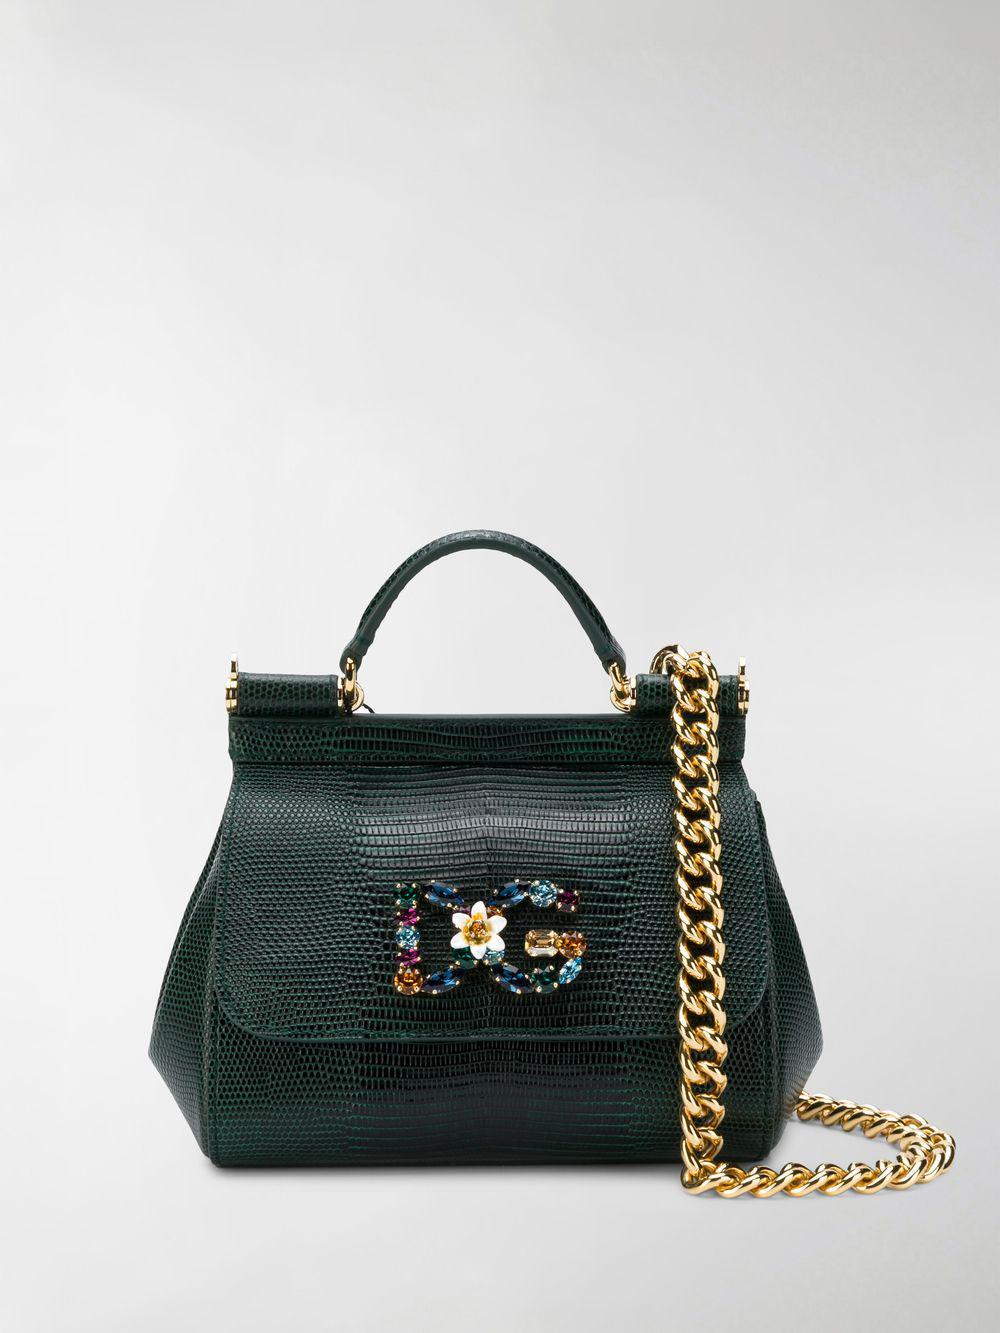 Lyst - Dolce   Gabbana Small Sicily Shoulder Bag in Green 4aec67a5af